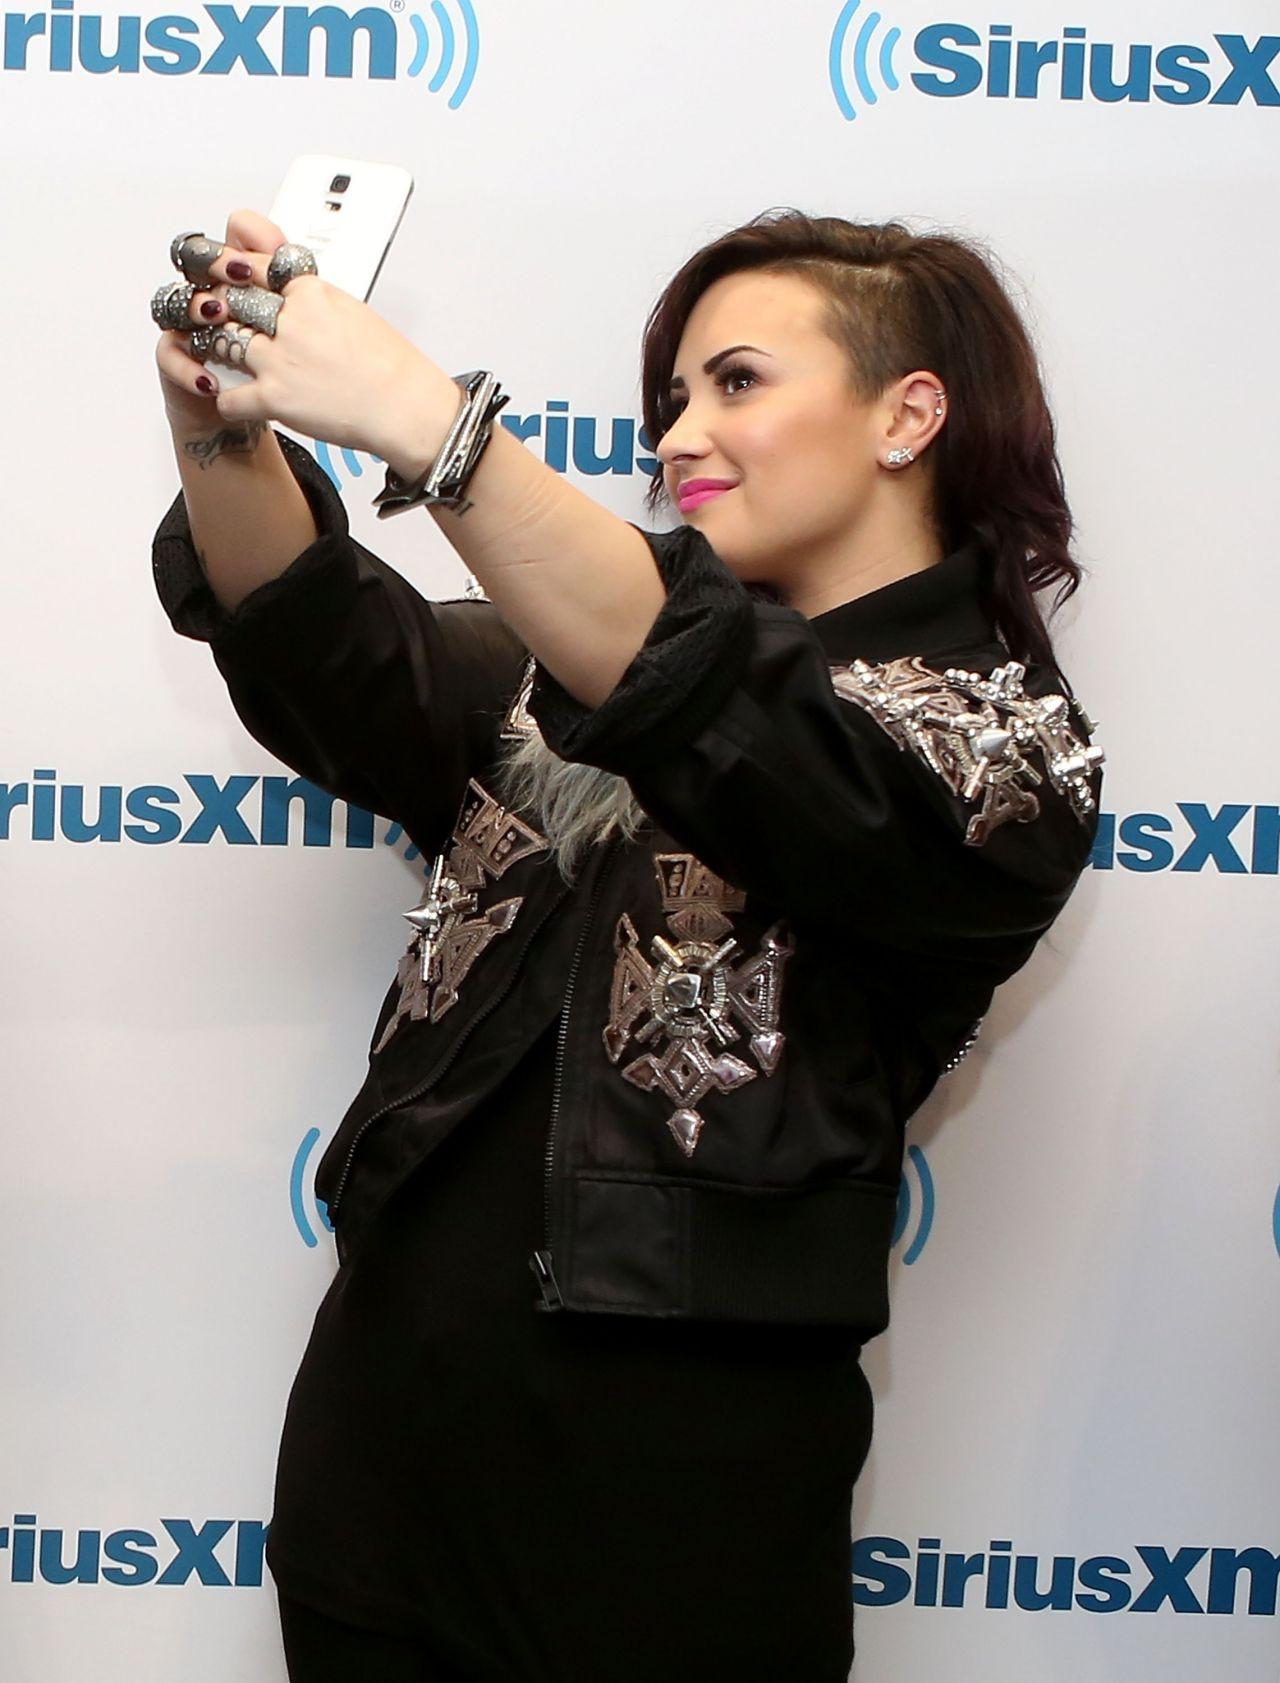 Demi Lovato Siriusxm Studios York City June